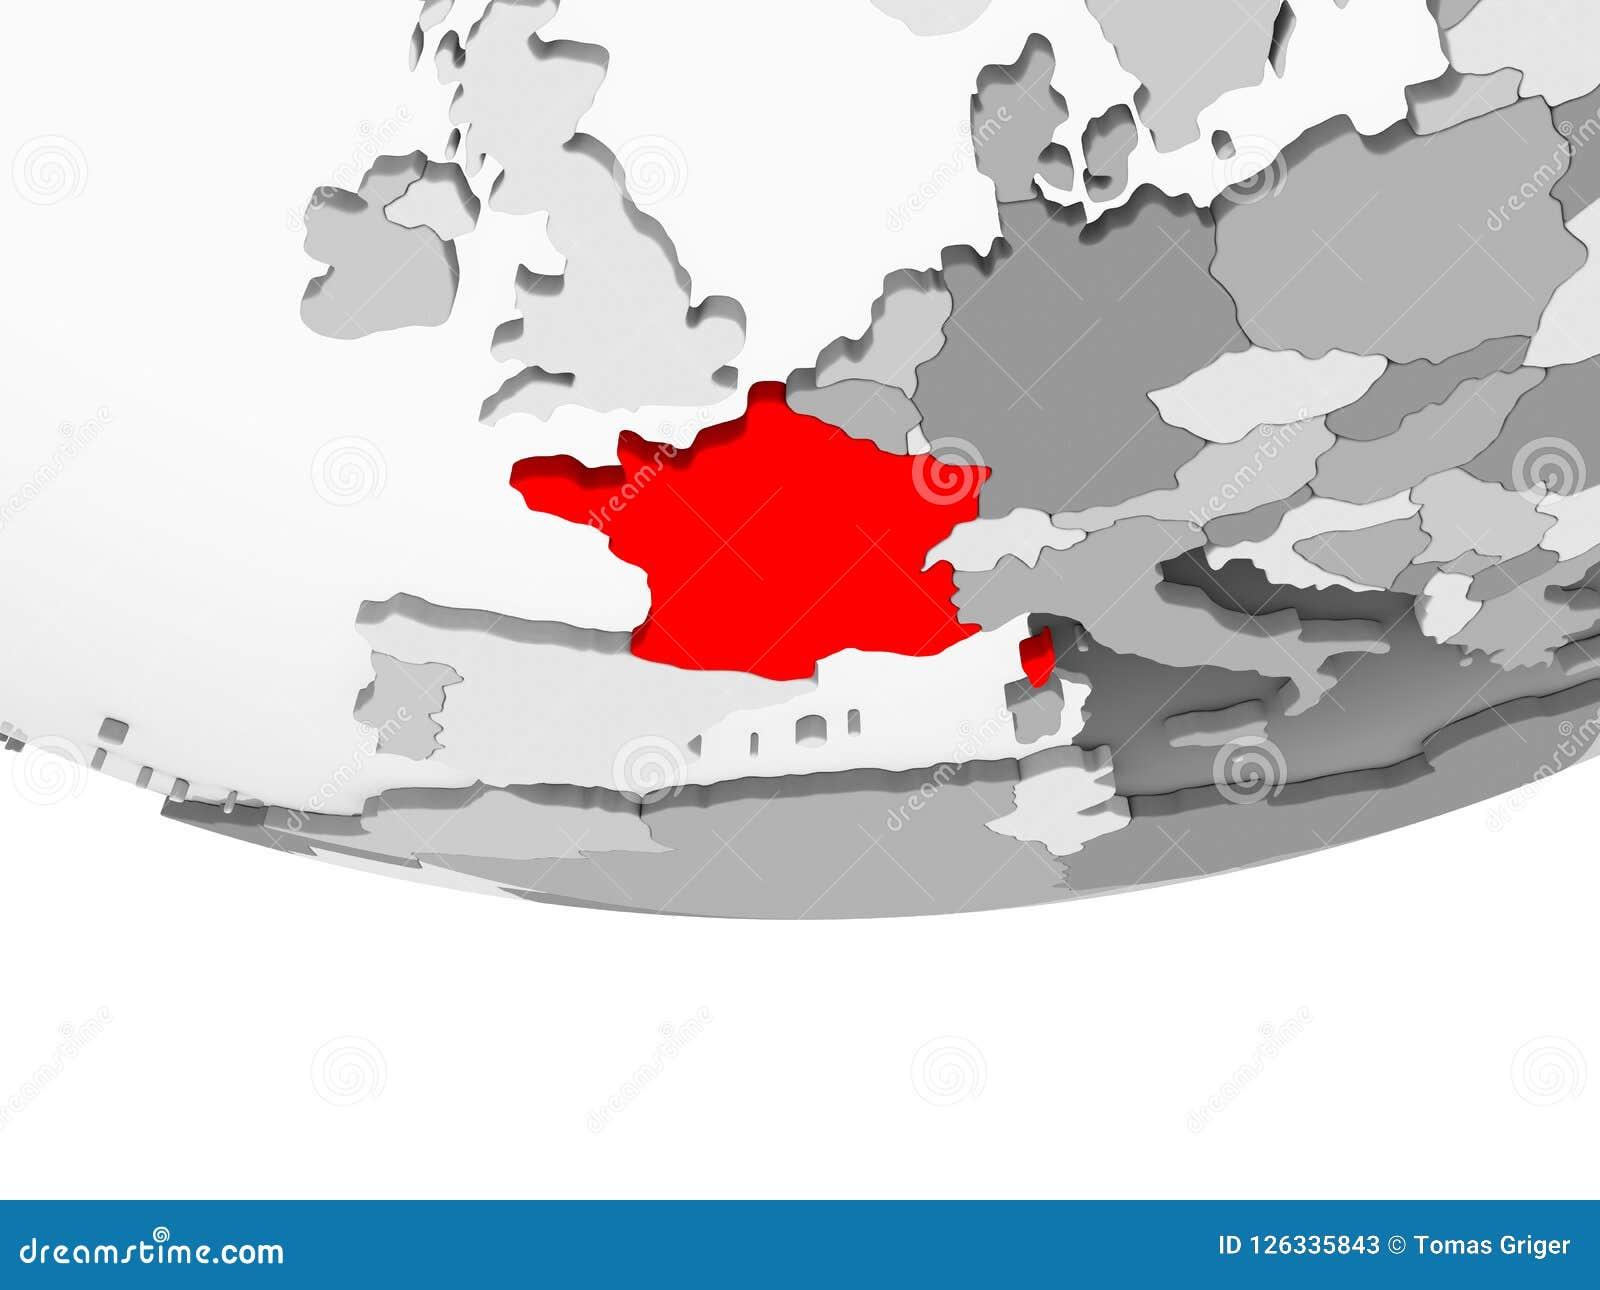 Map Of France Political.Map Of France On Grey Political Globe Stock Illustration